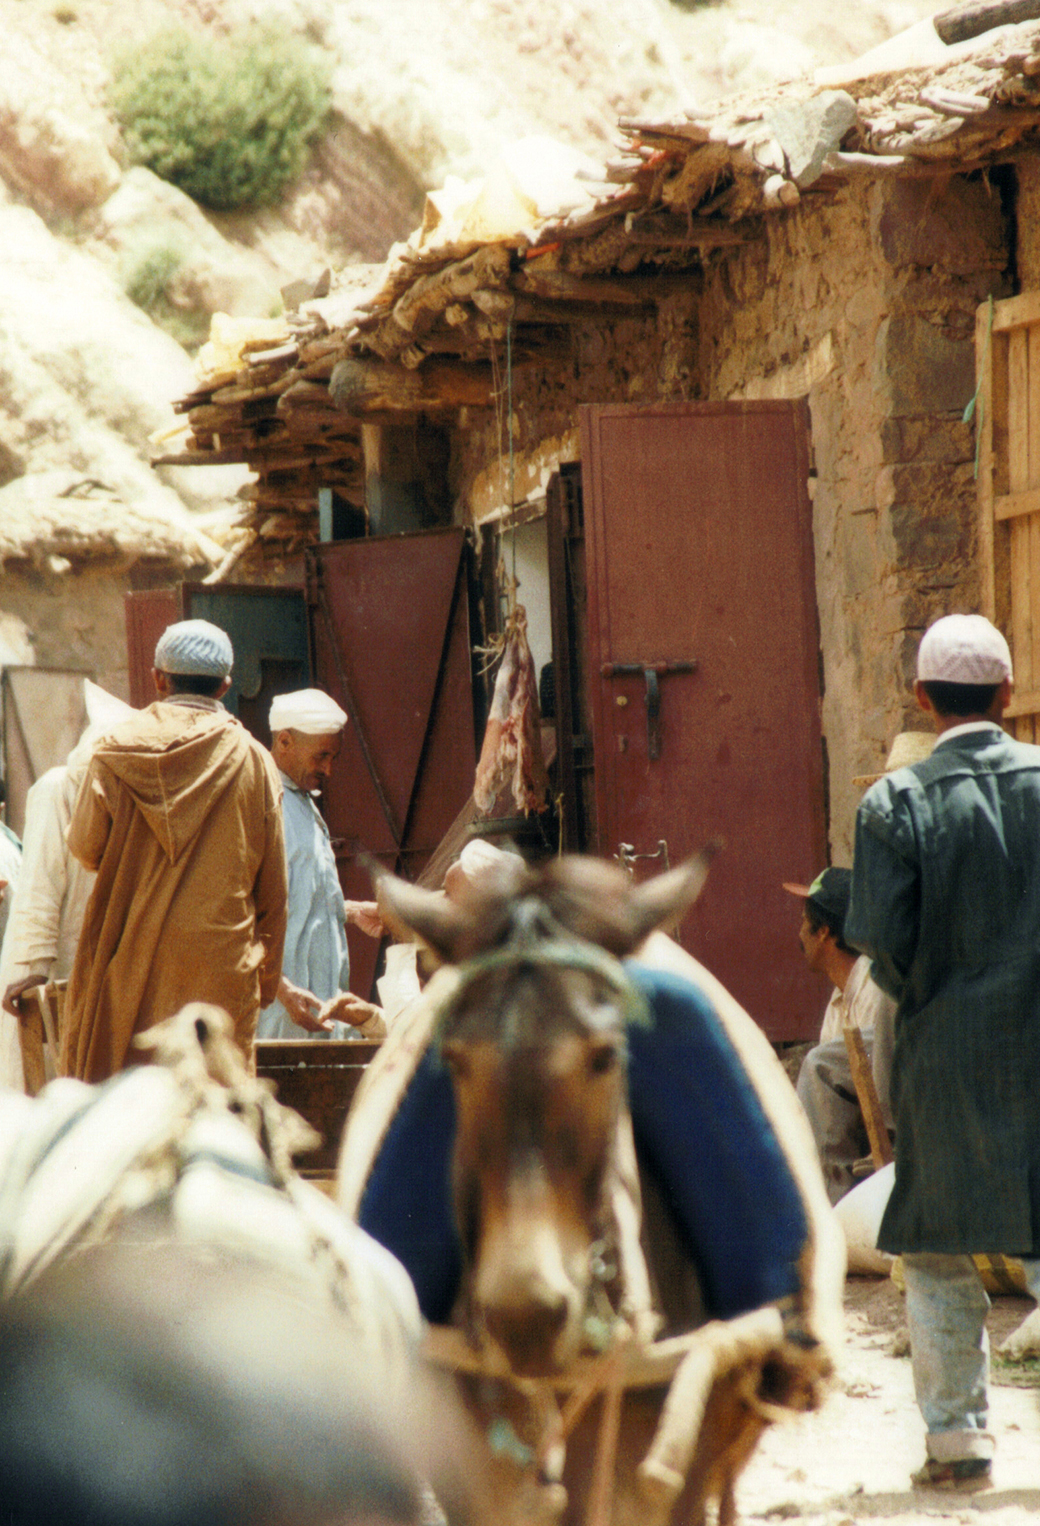 Maroc 3Wallpapers iphone Parallax Maroc